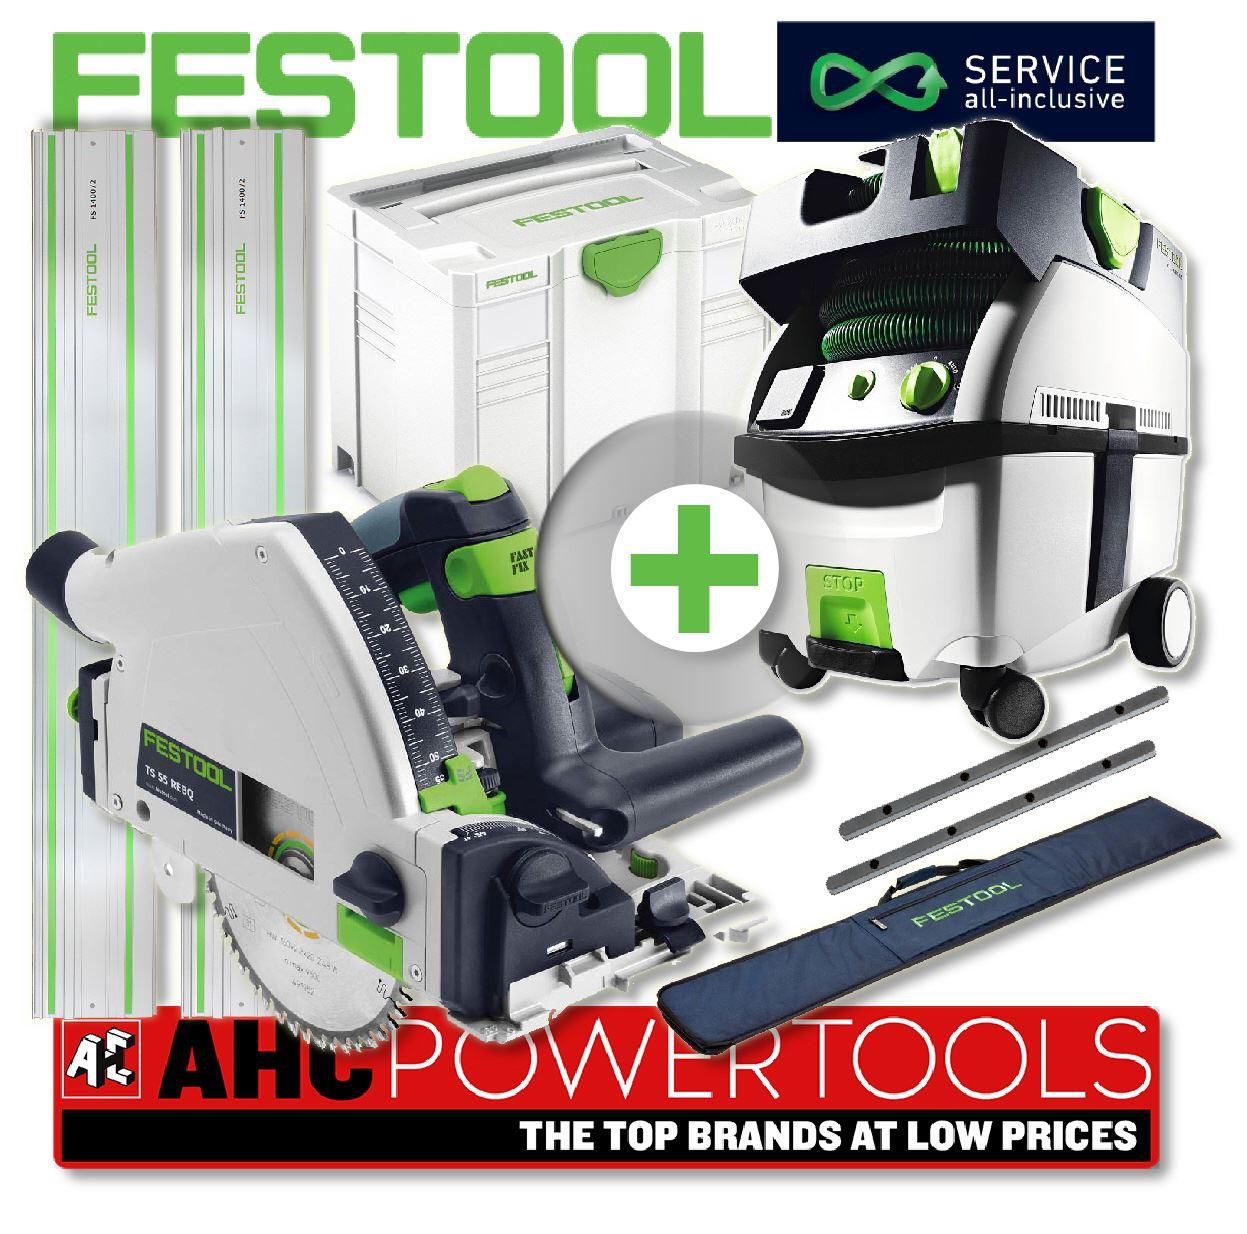 festool circular saw ts 55 rebq plus fs gb ctl midi dust extractor 240v ebay. Black Bedroom Furniture Sets. Home Design Ideas